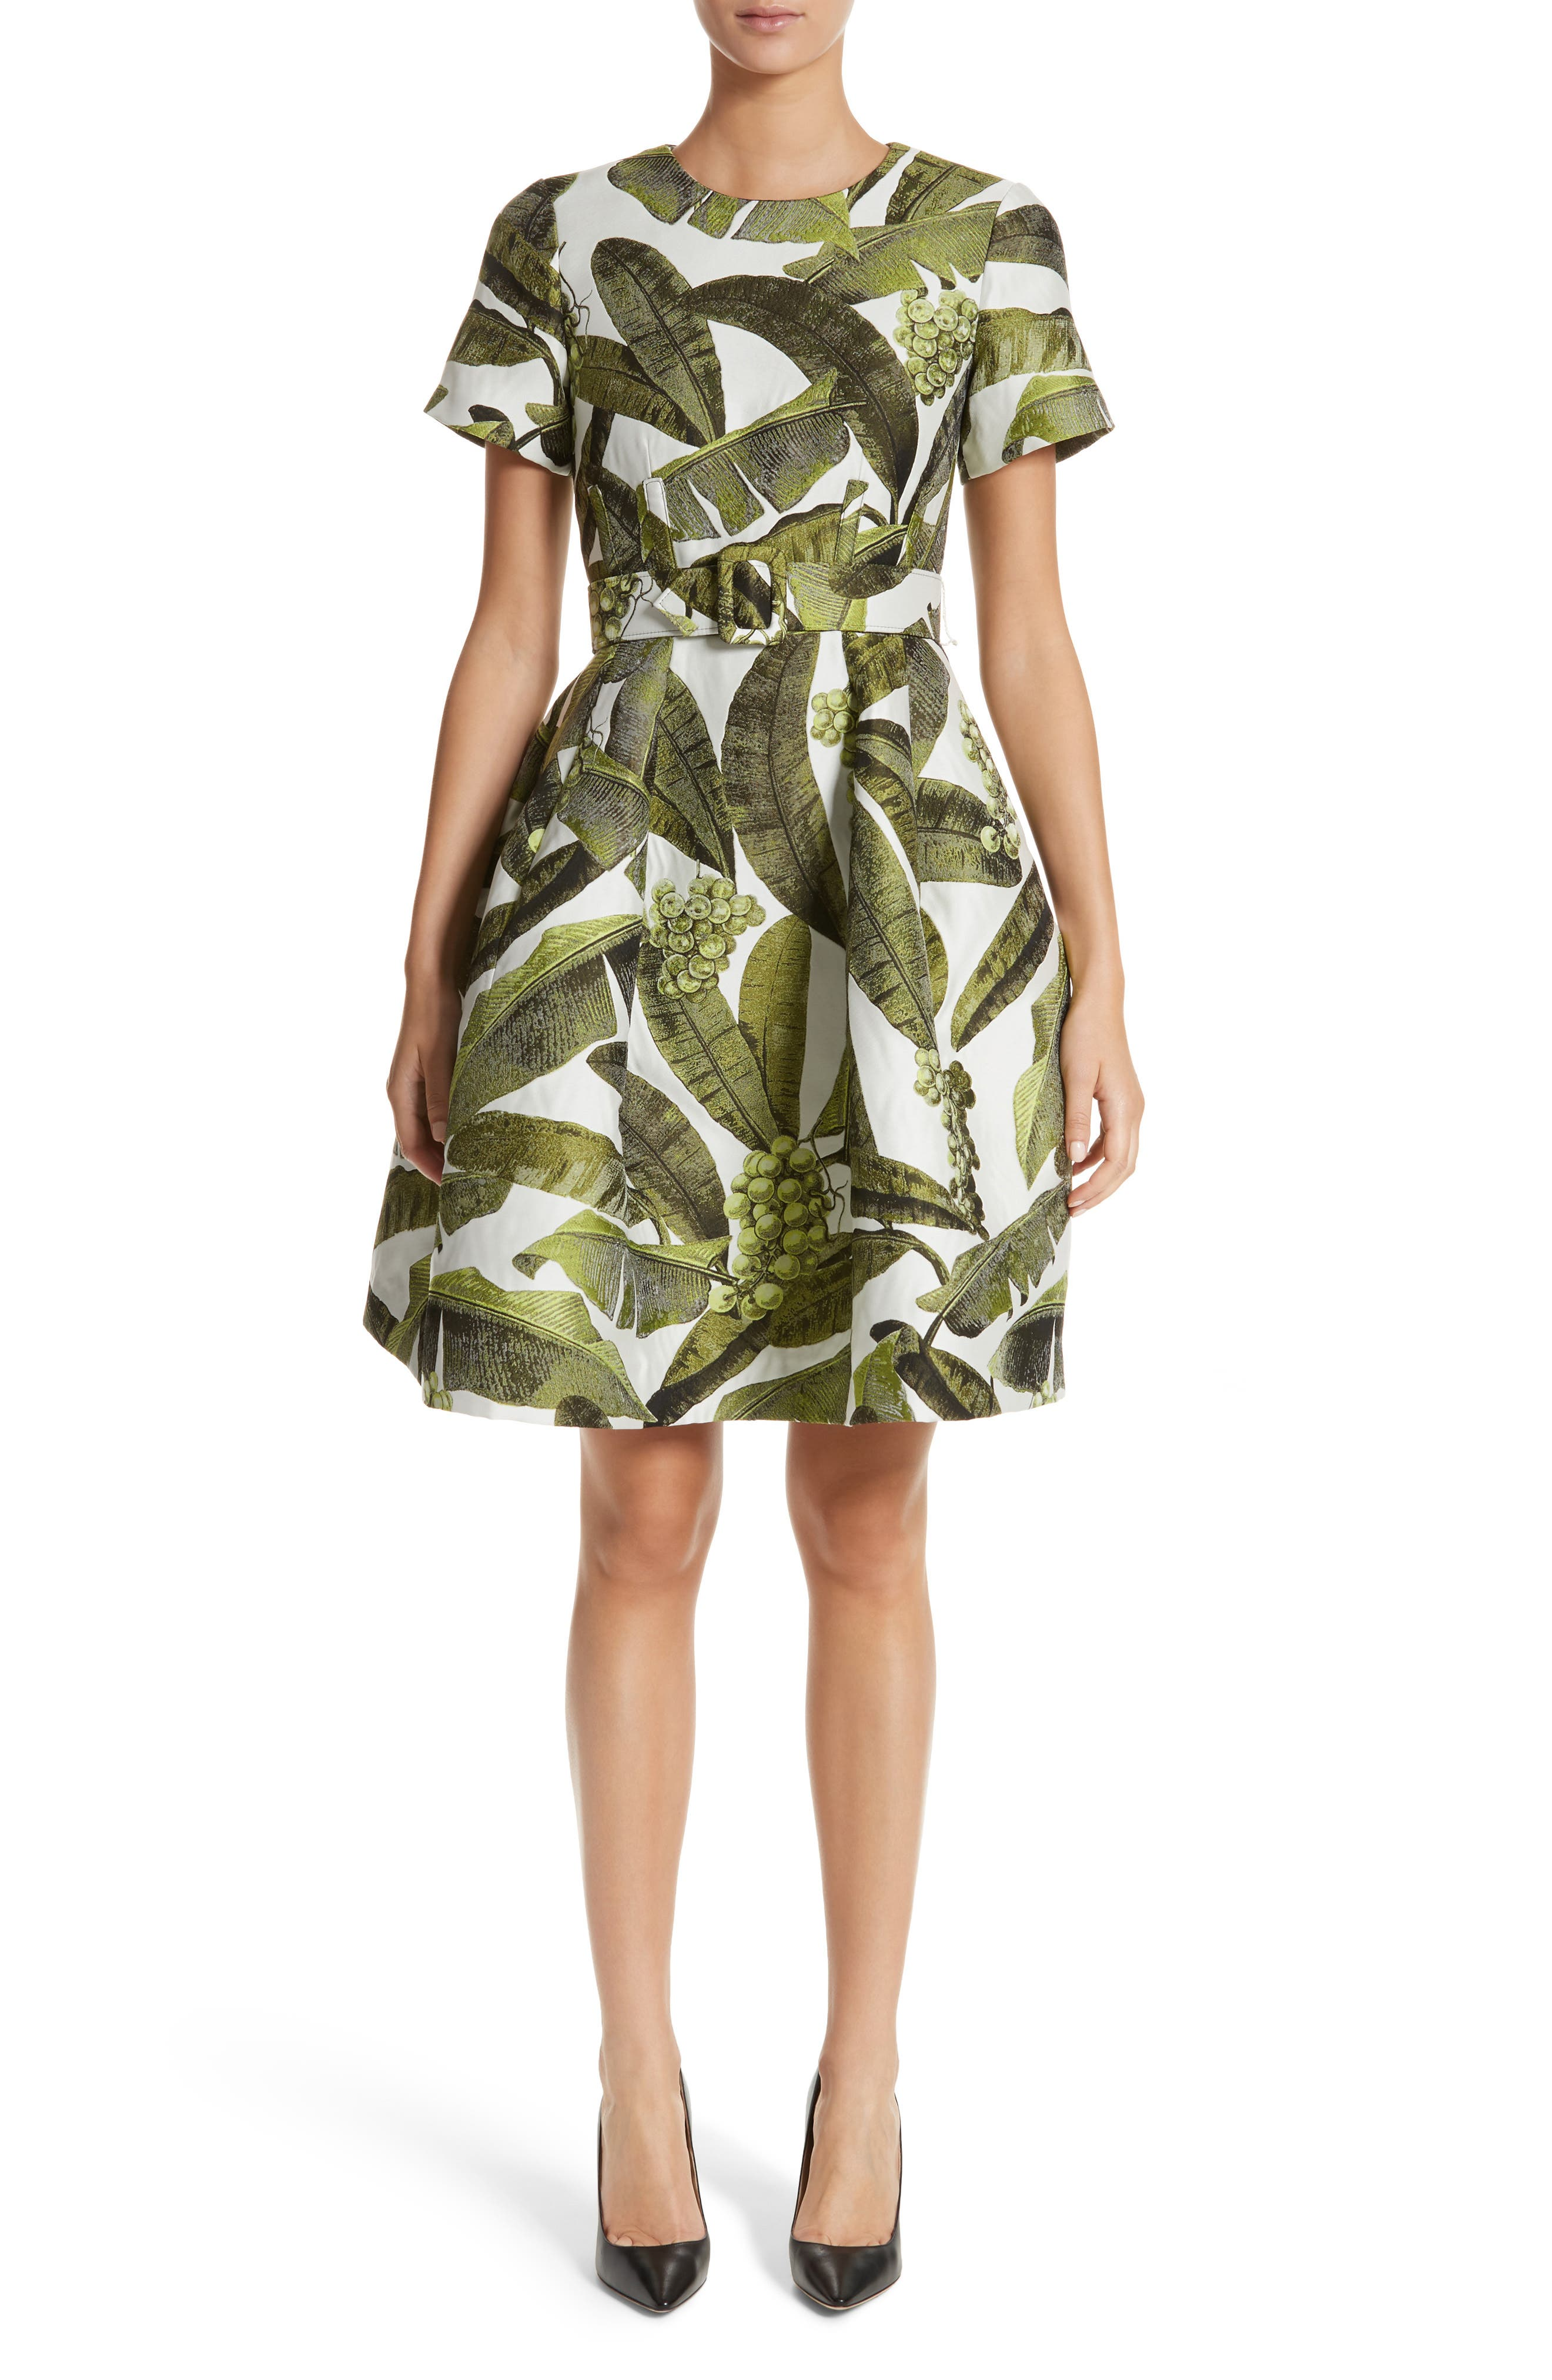 Oscar de la Renta Leaf Jacquard Dress